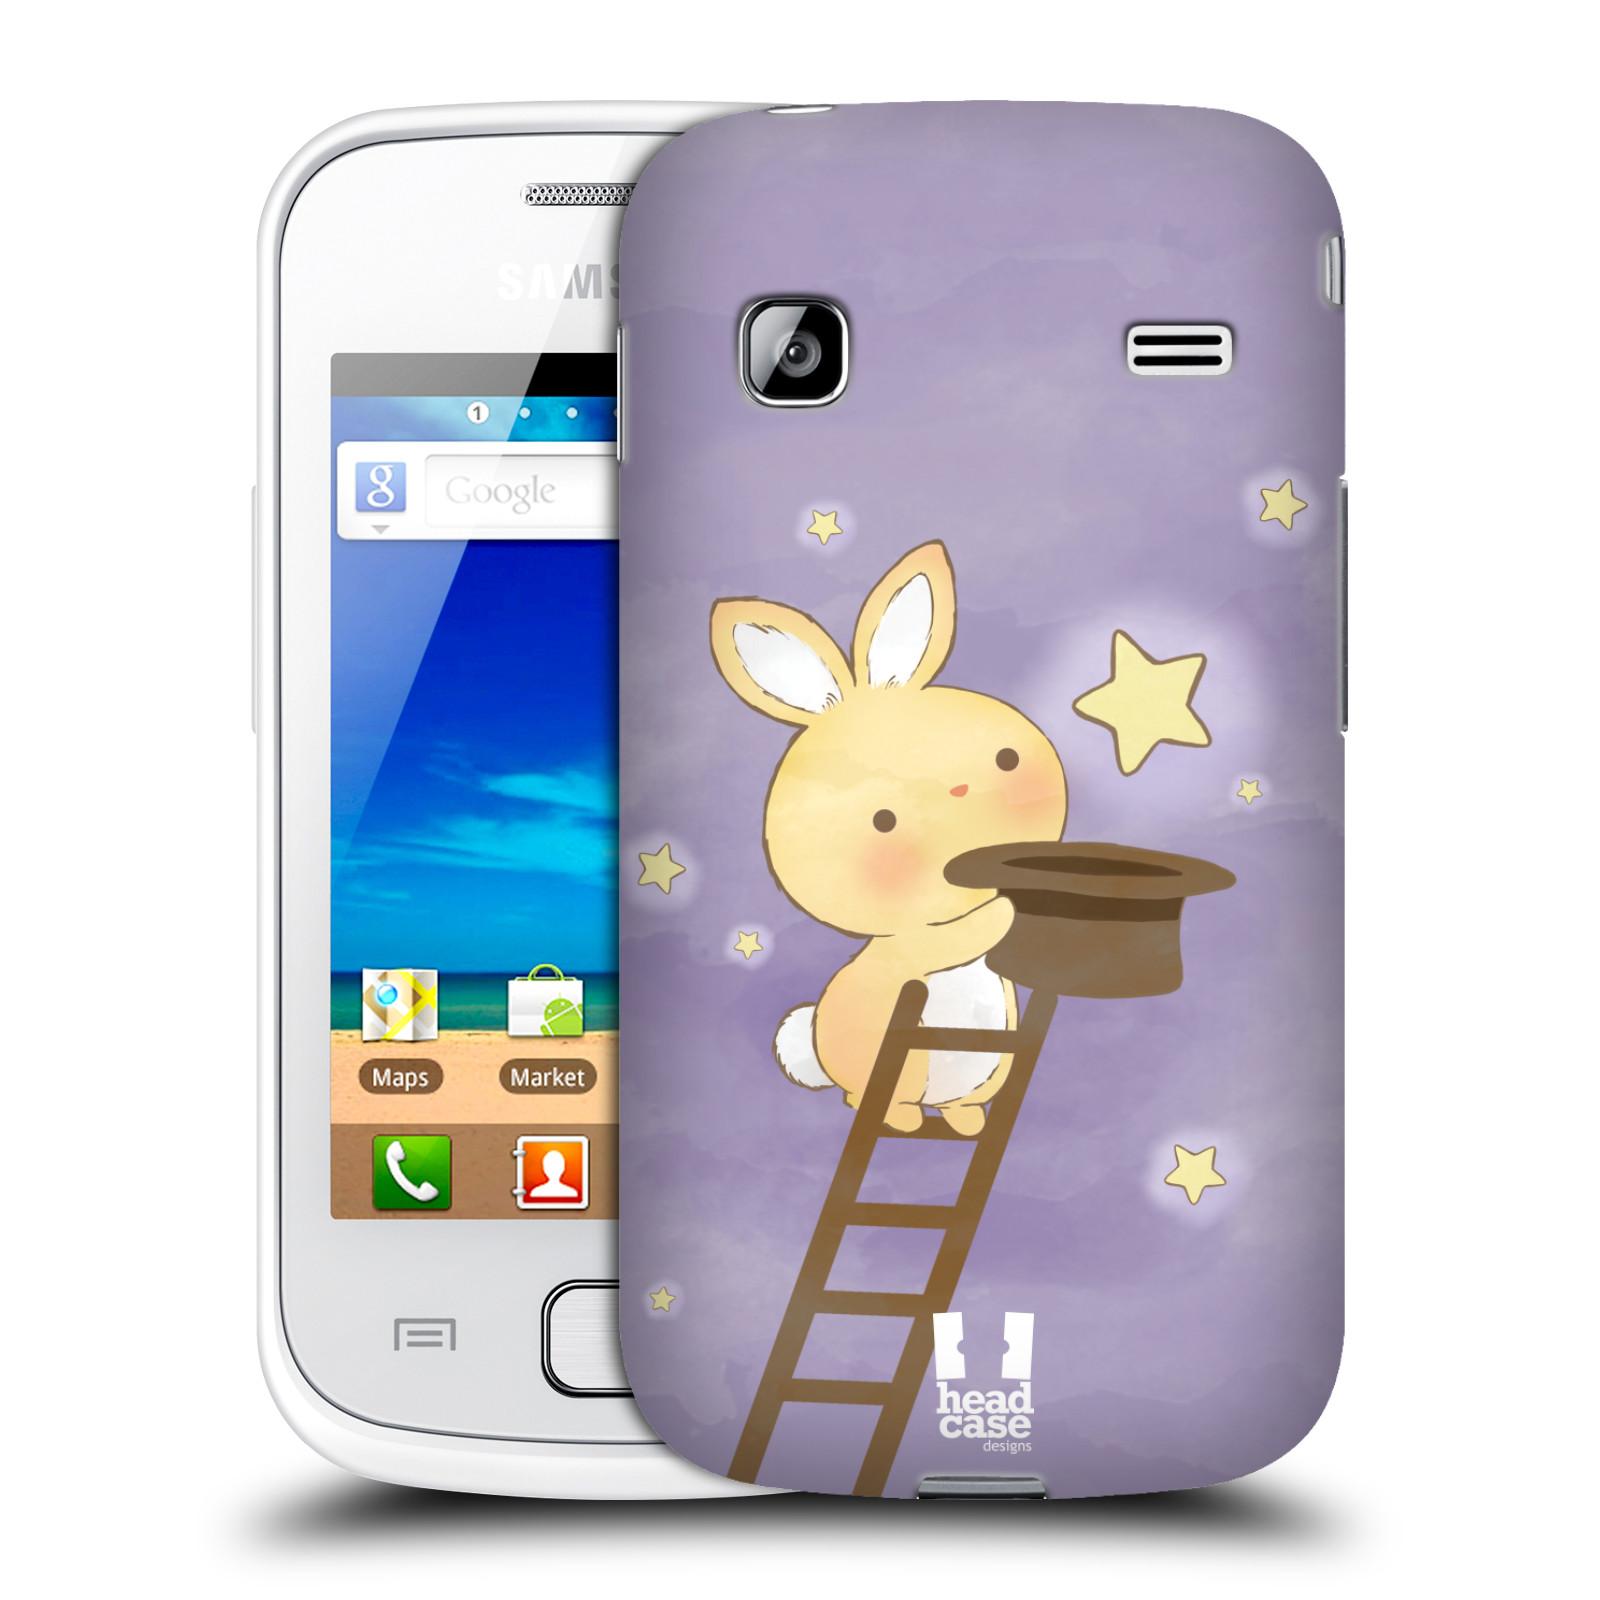 HEAD CASE plastový obal na mobil SAMSUNG GALAXY GIO (S5660) vzor králíček a hvězdy fialová